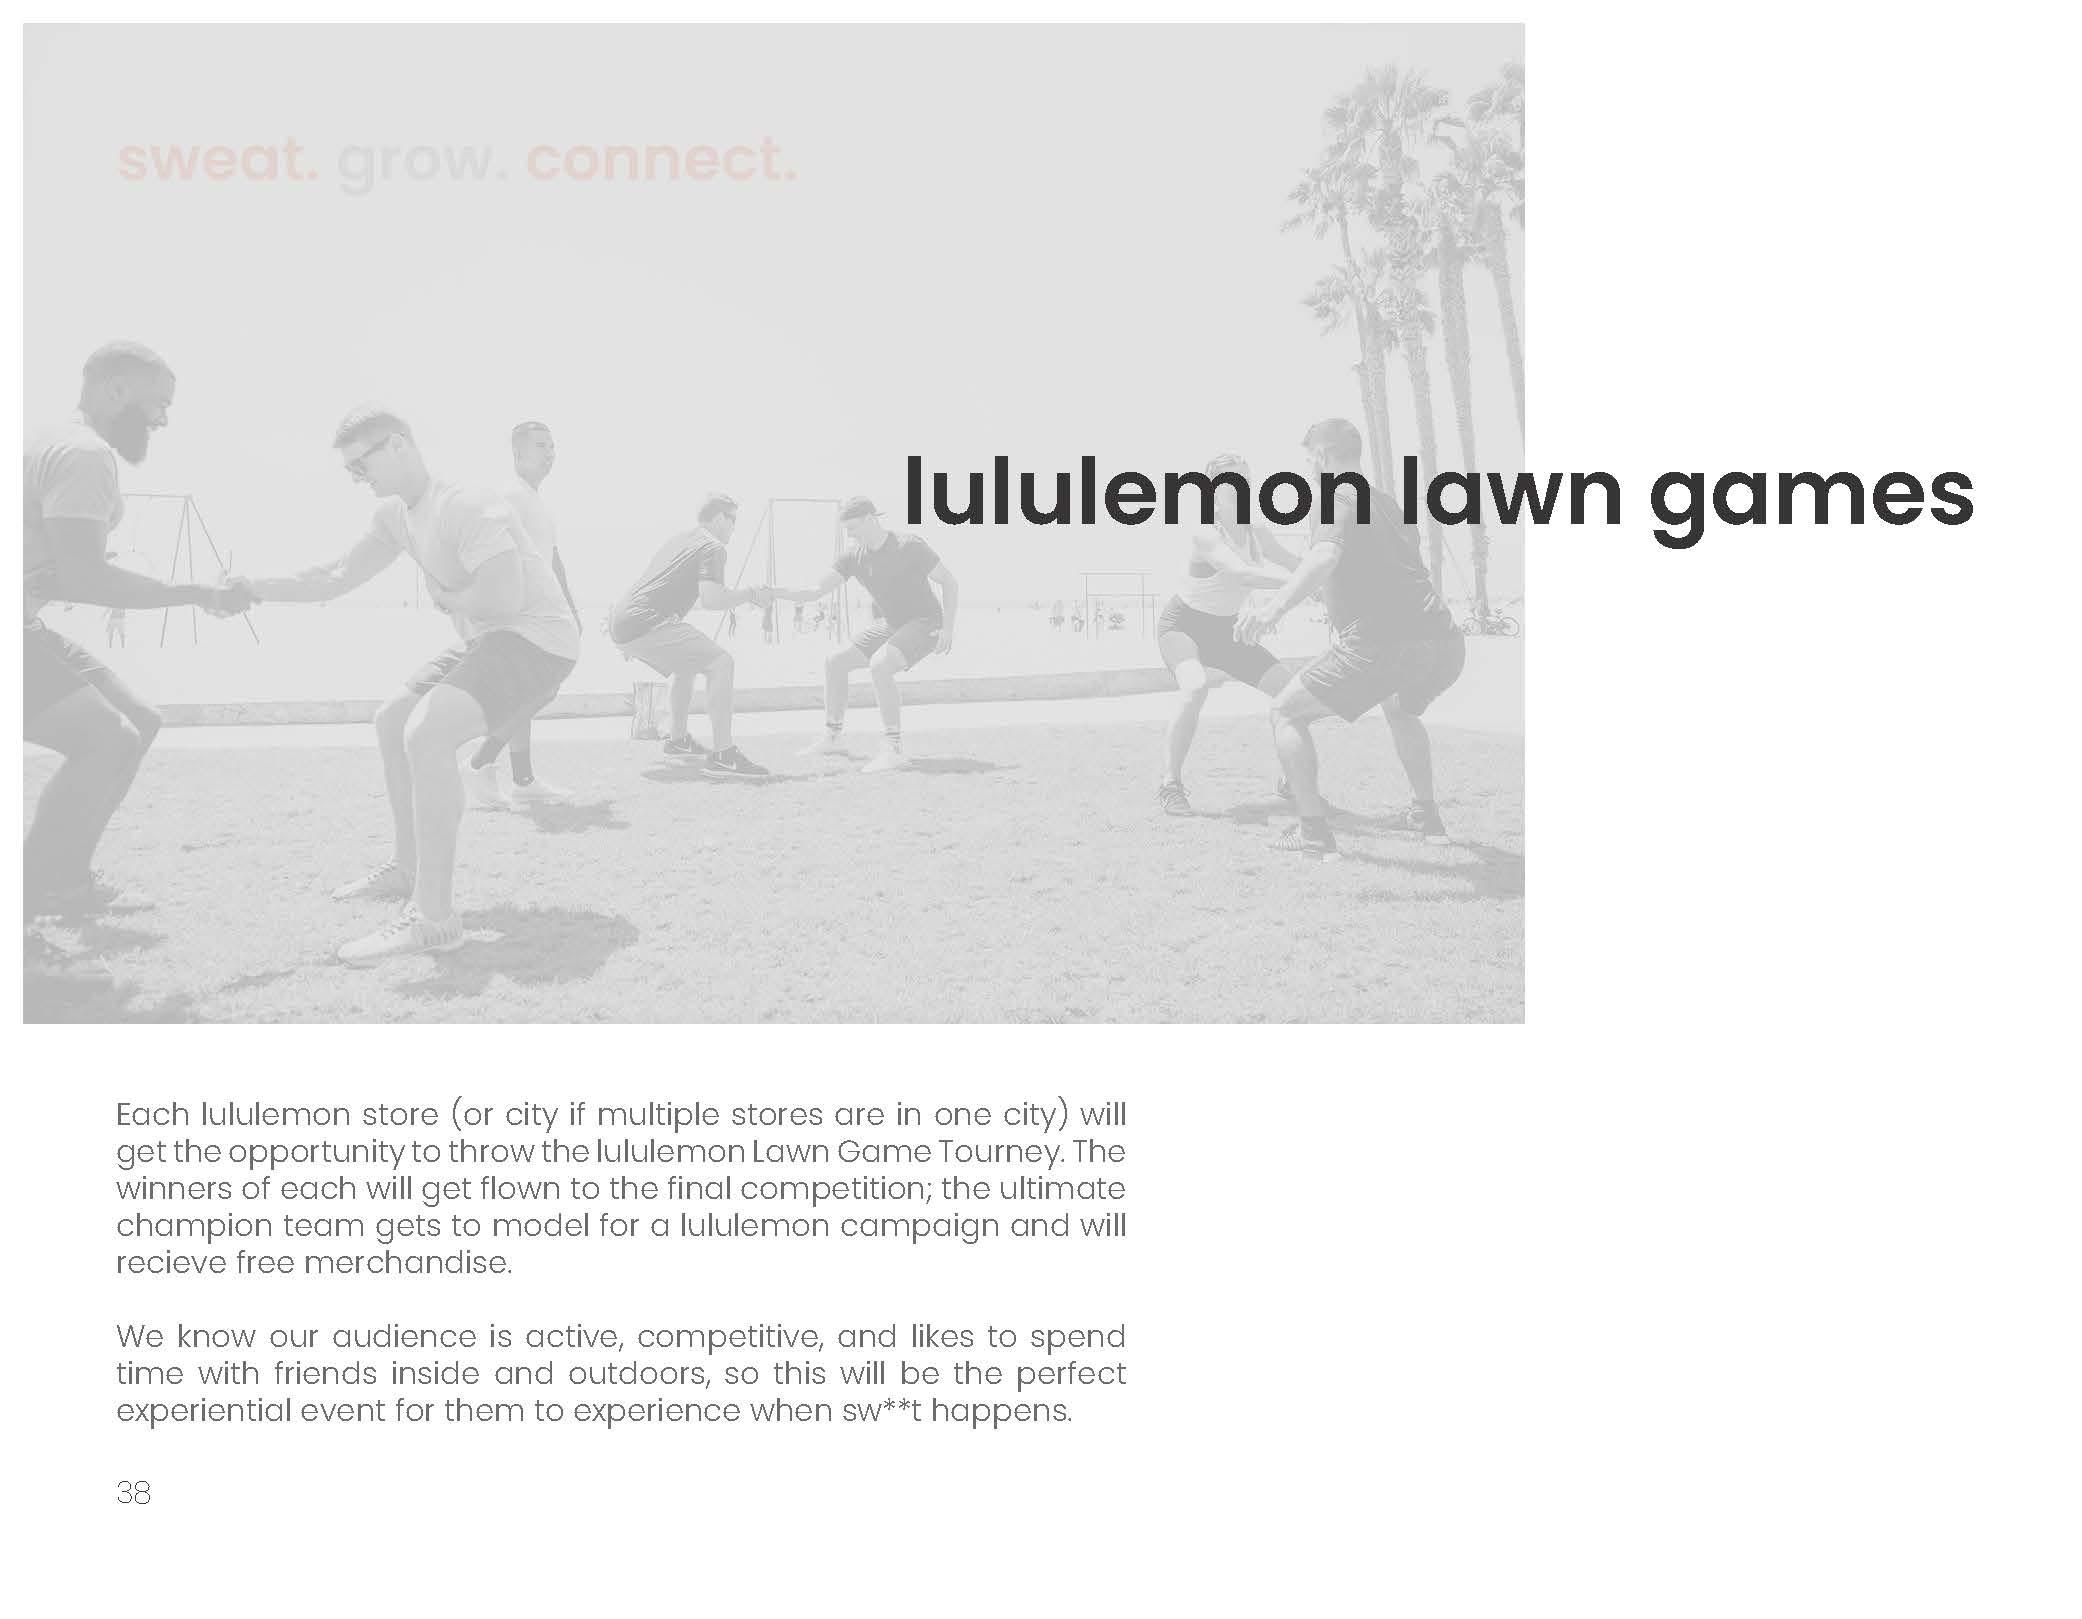 Nellah_FinalPitchBook_Portfolio_lululemon_Page_38.jpg